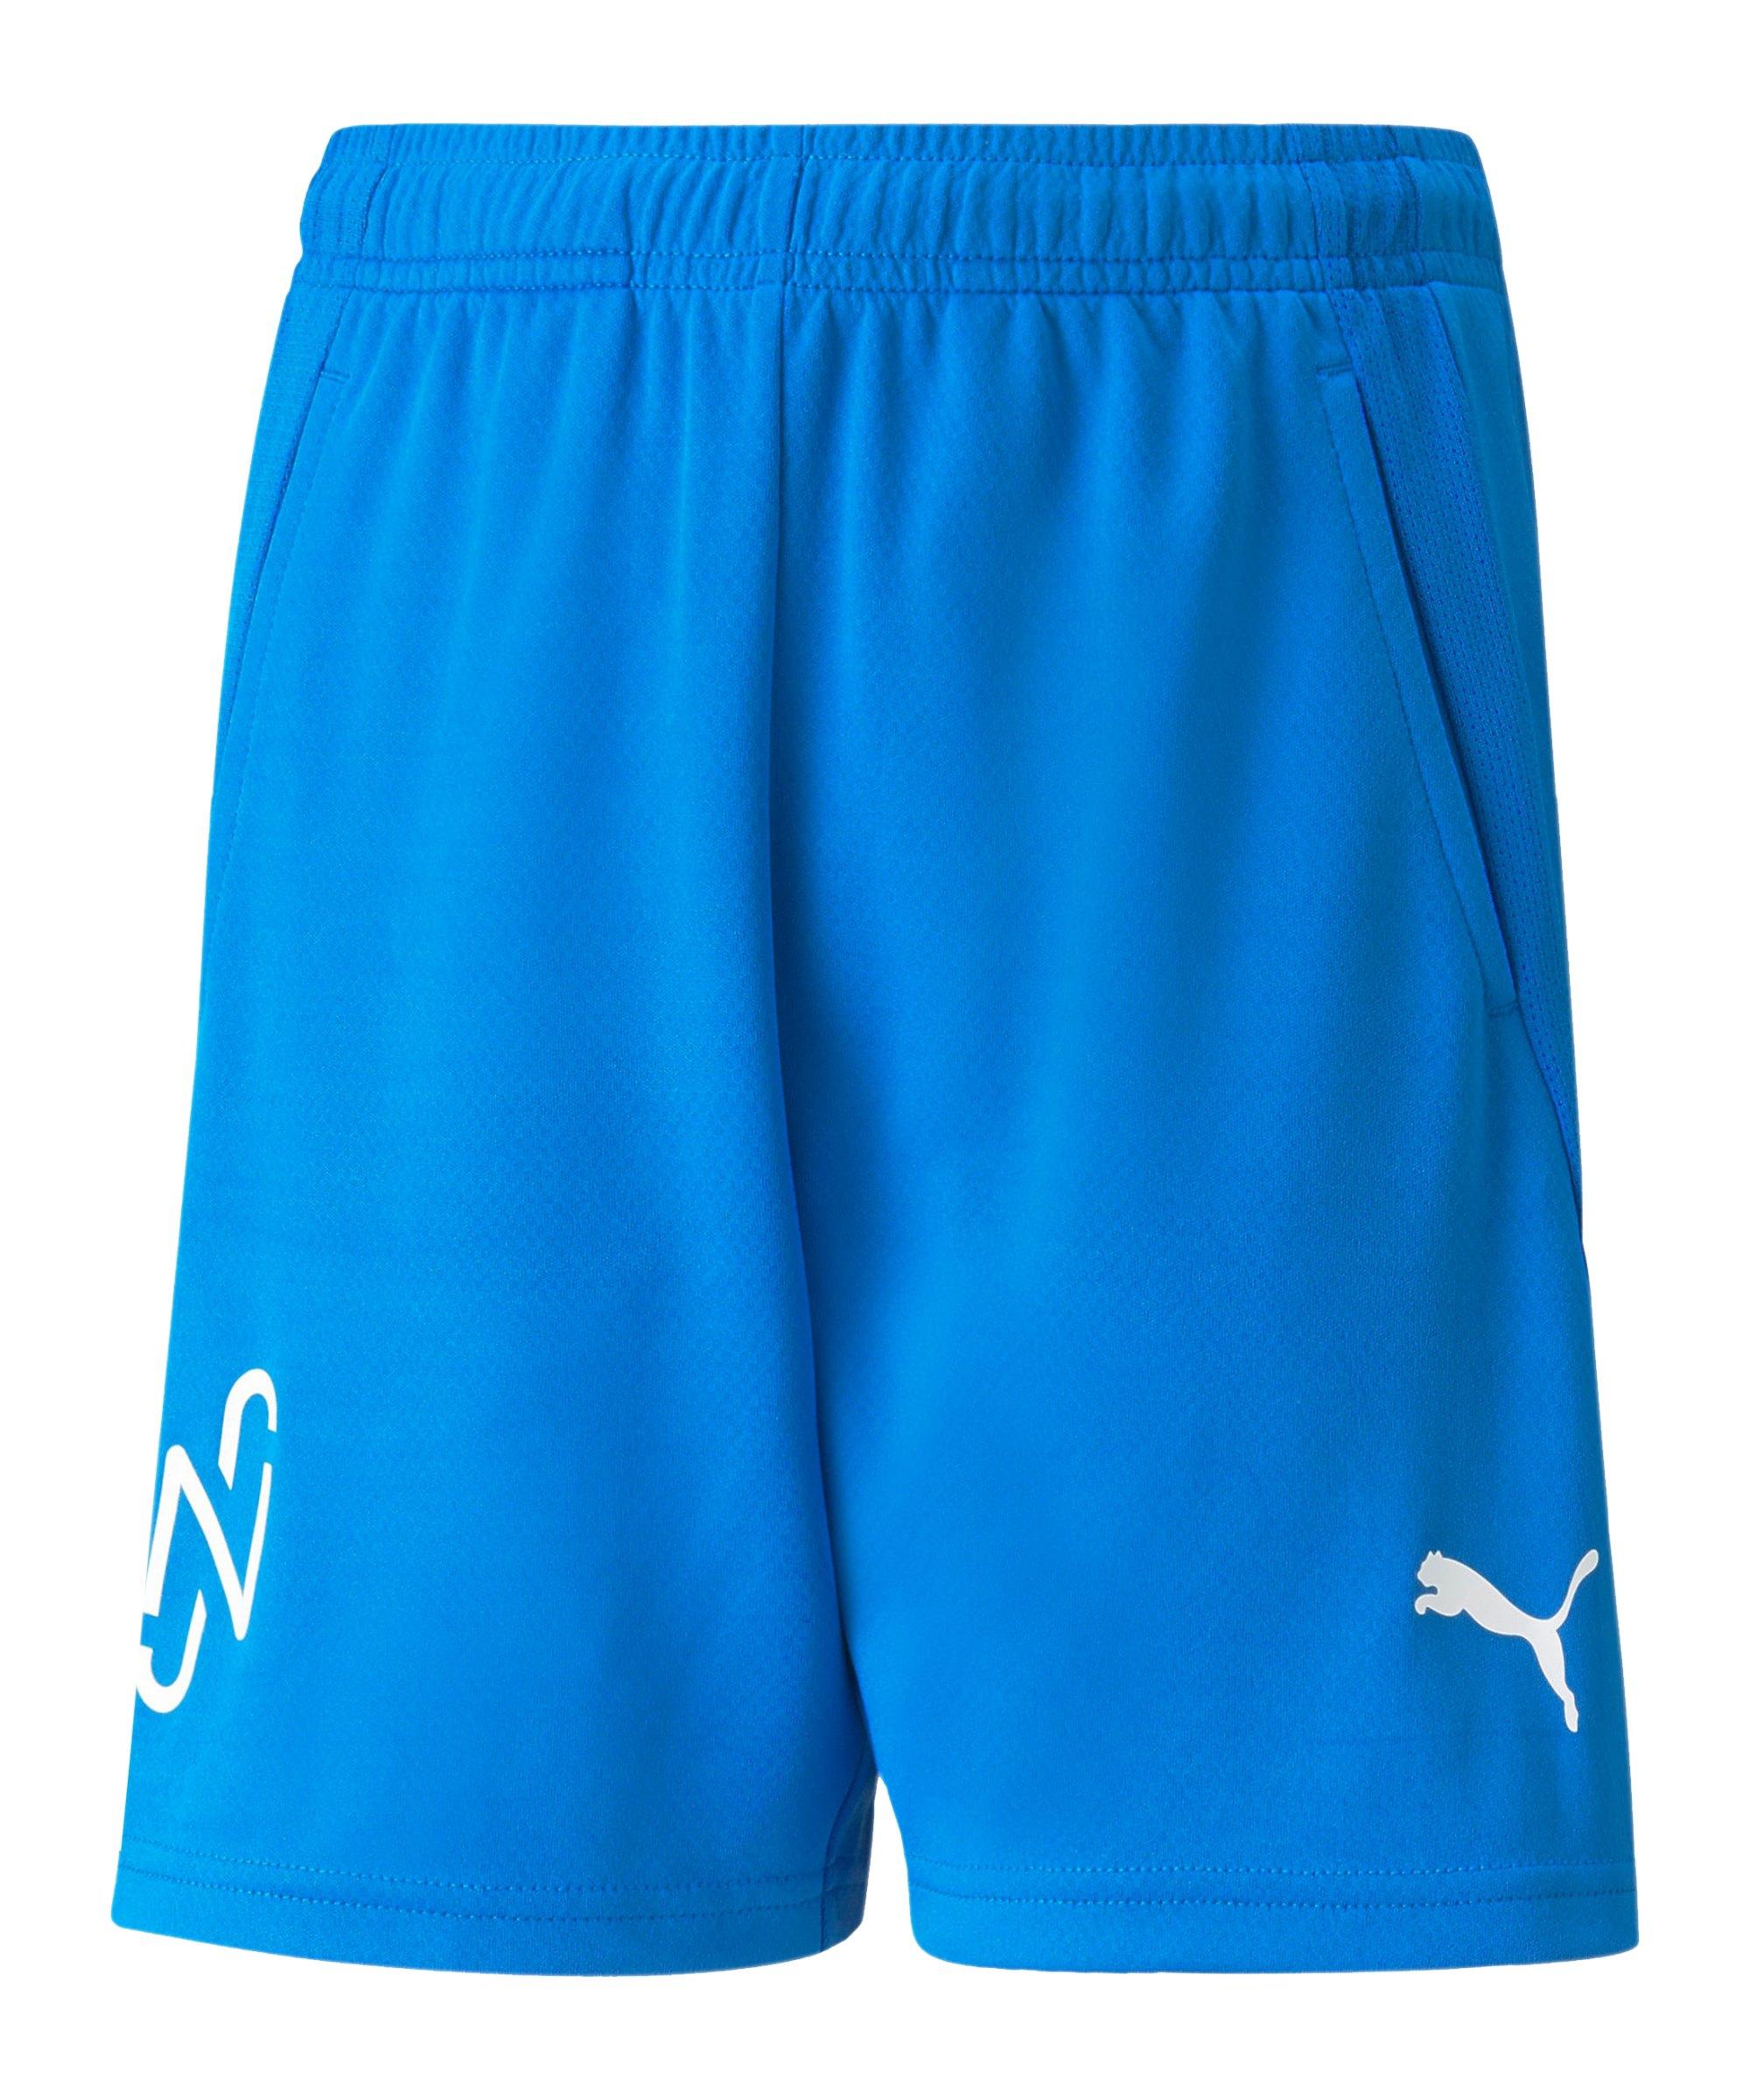 PUMA NJR Copa Short Kids Blau F08 - blau